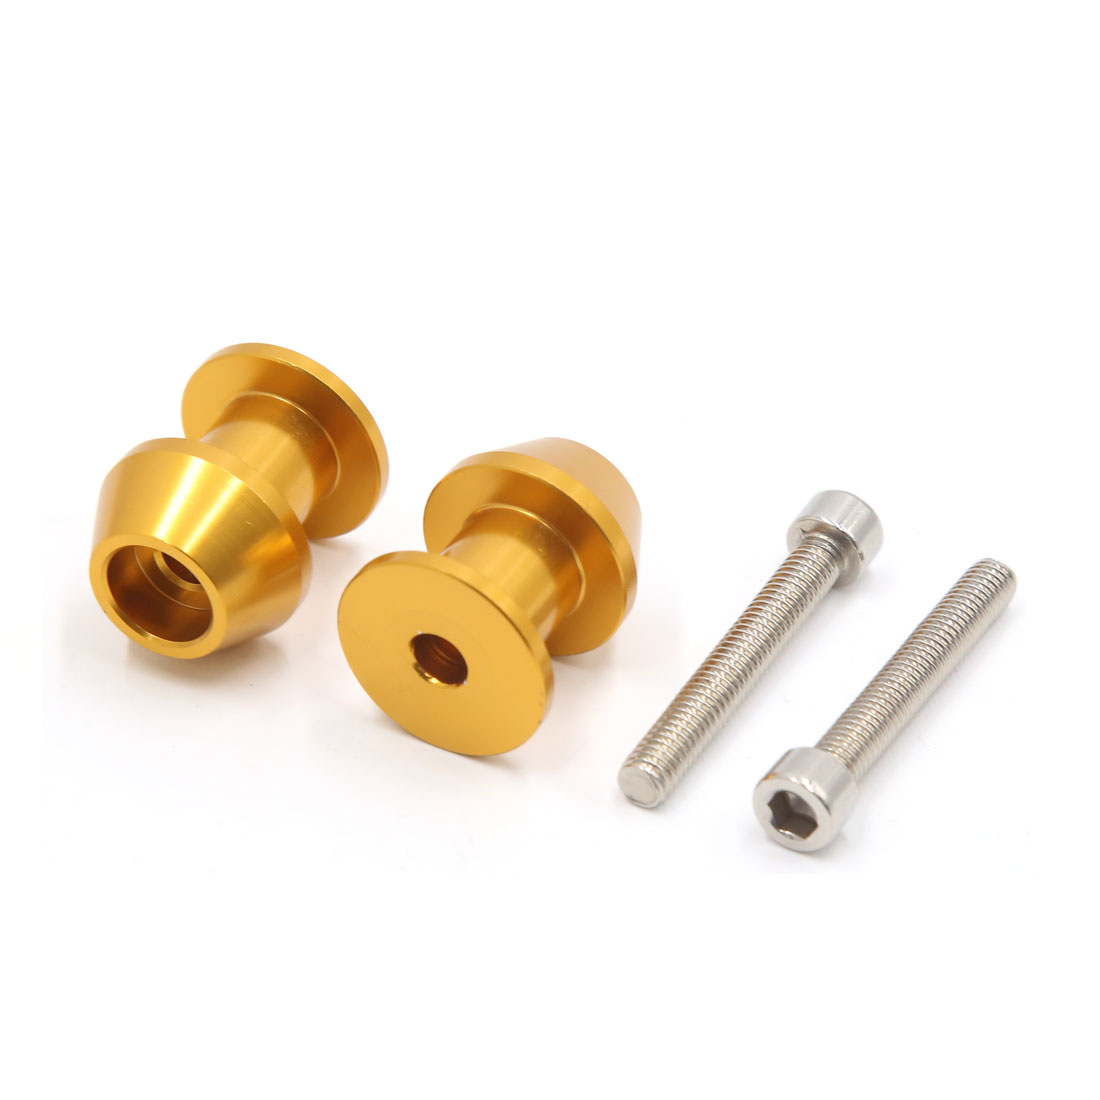 Pair Gold Tone Metal 6mm Thread Dia CNC Swingarm Spools Sliders Stand Bobbins